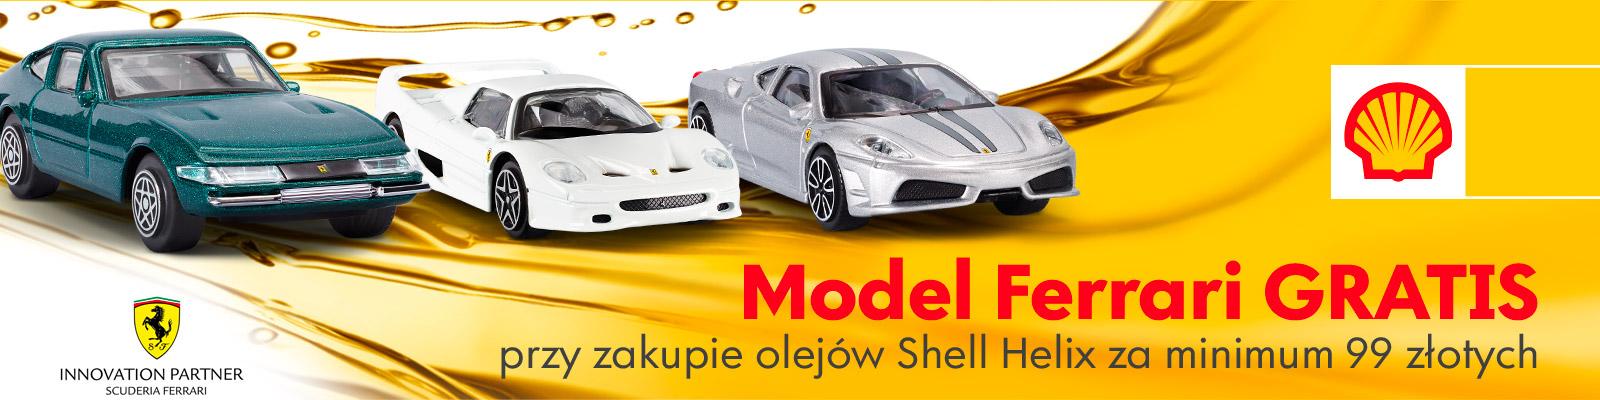 Model Ferrari Gratis